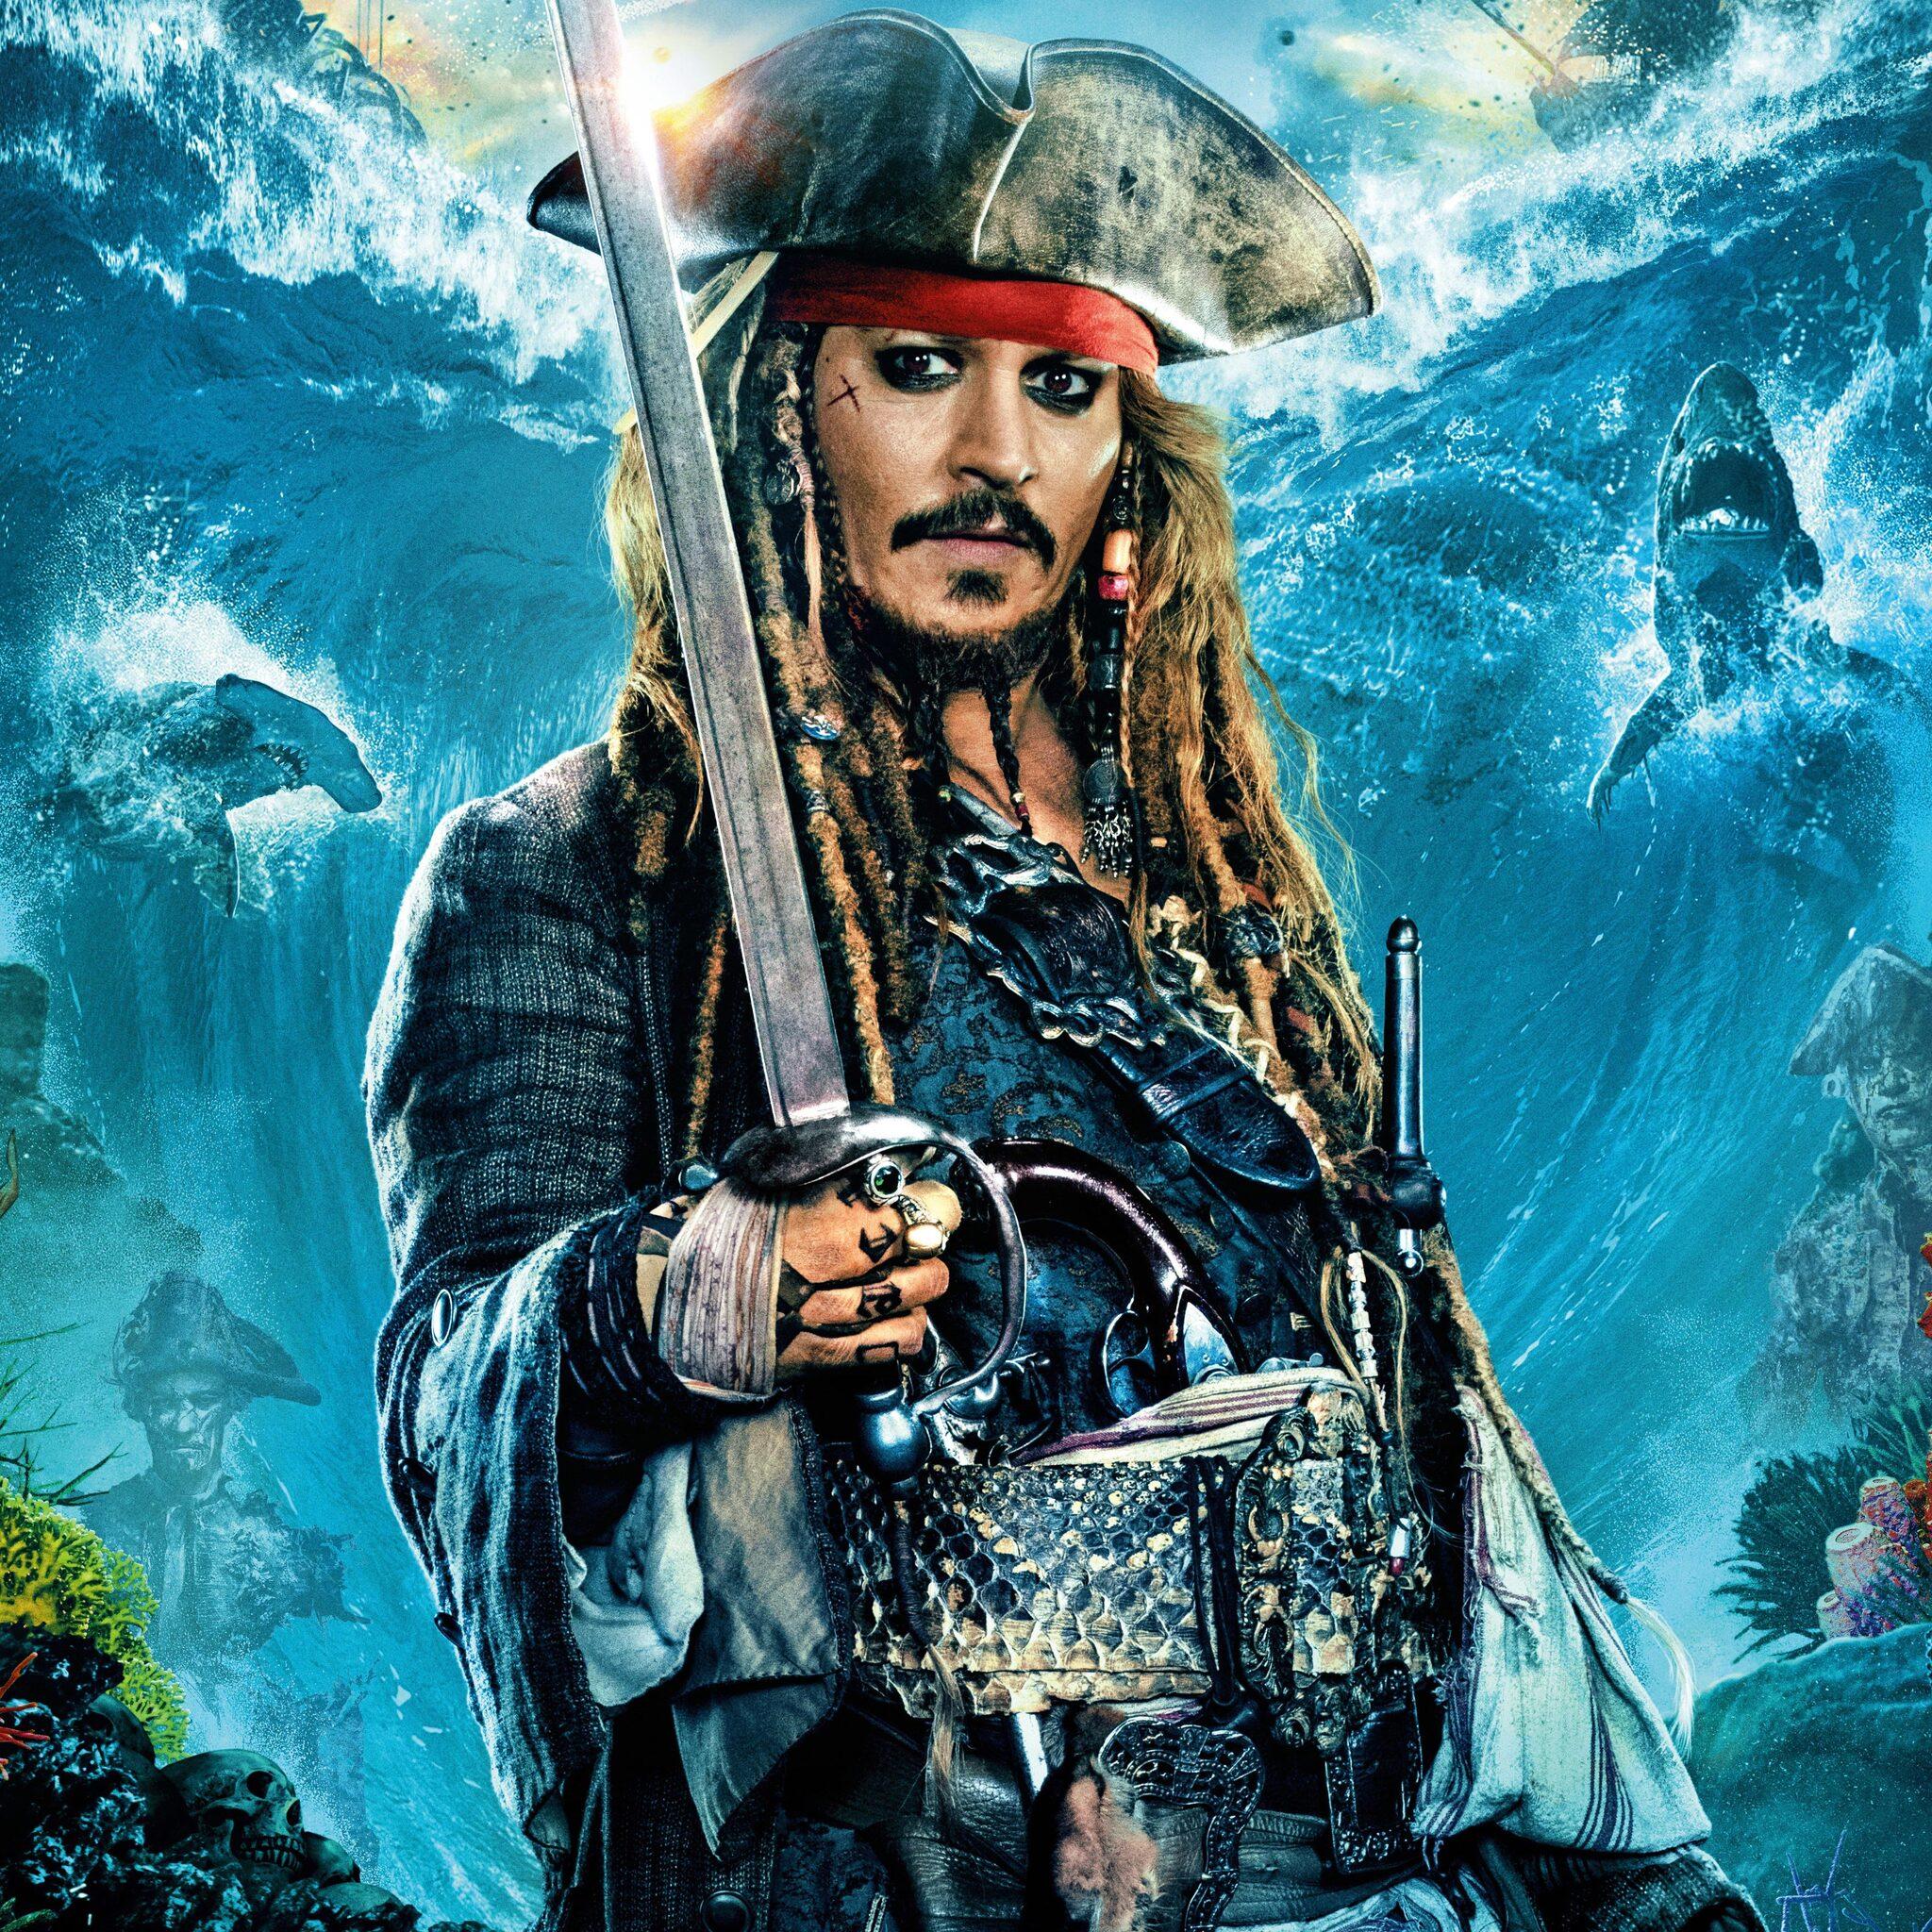 Pirates Of The Caribbean Wallpaper Hd: 2048x2048 Jack Sparrow In Pirates Of The Caribbean Dead